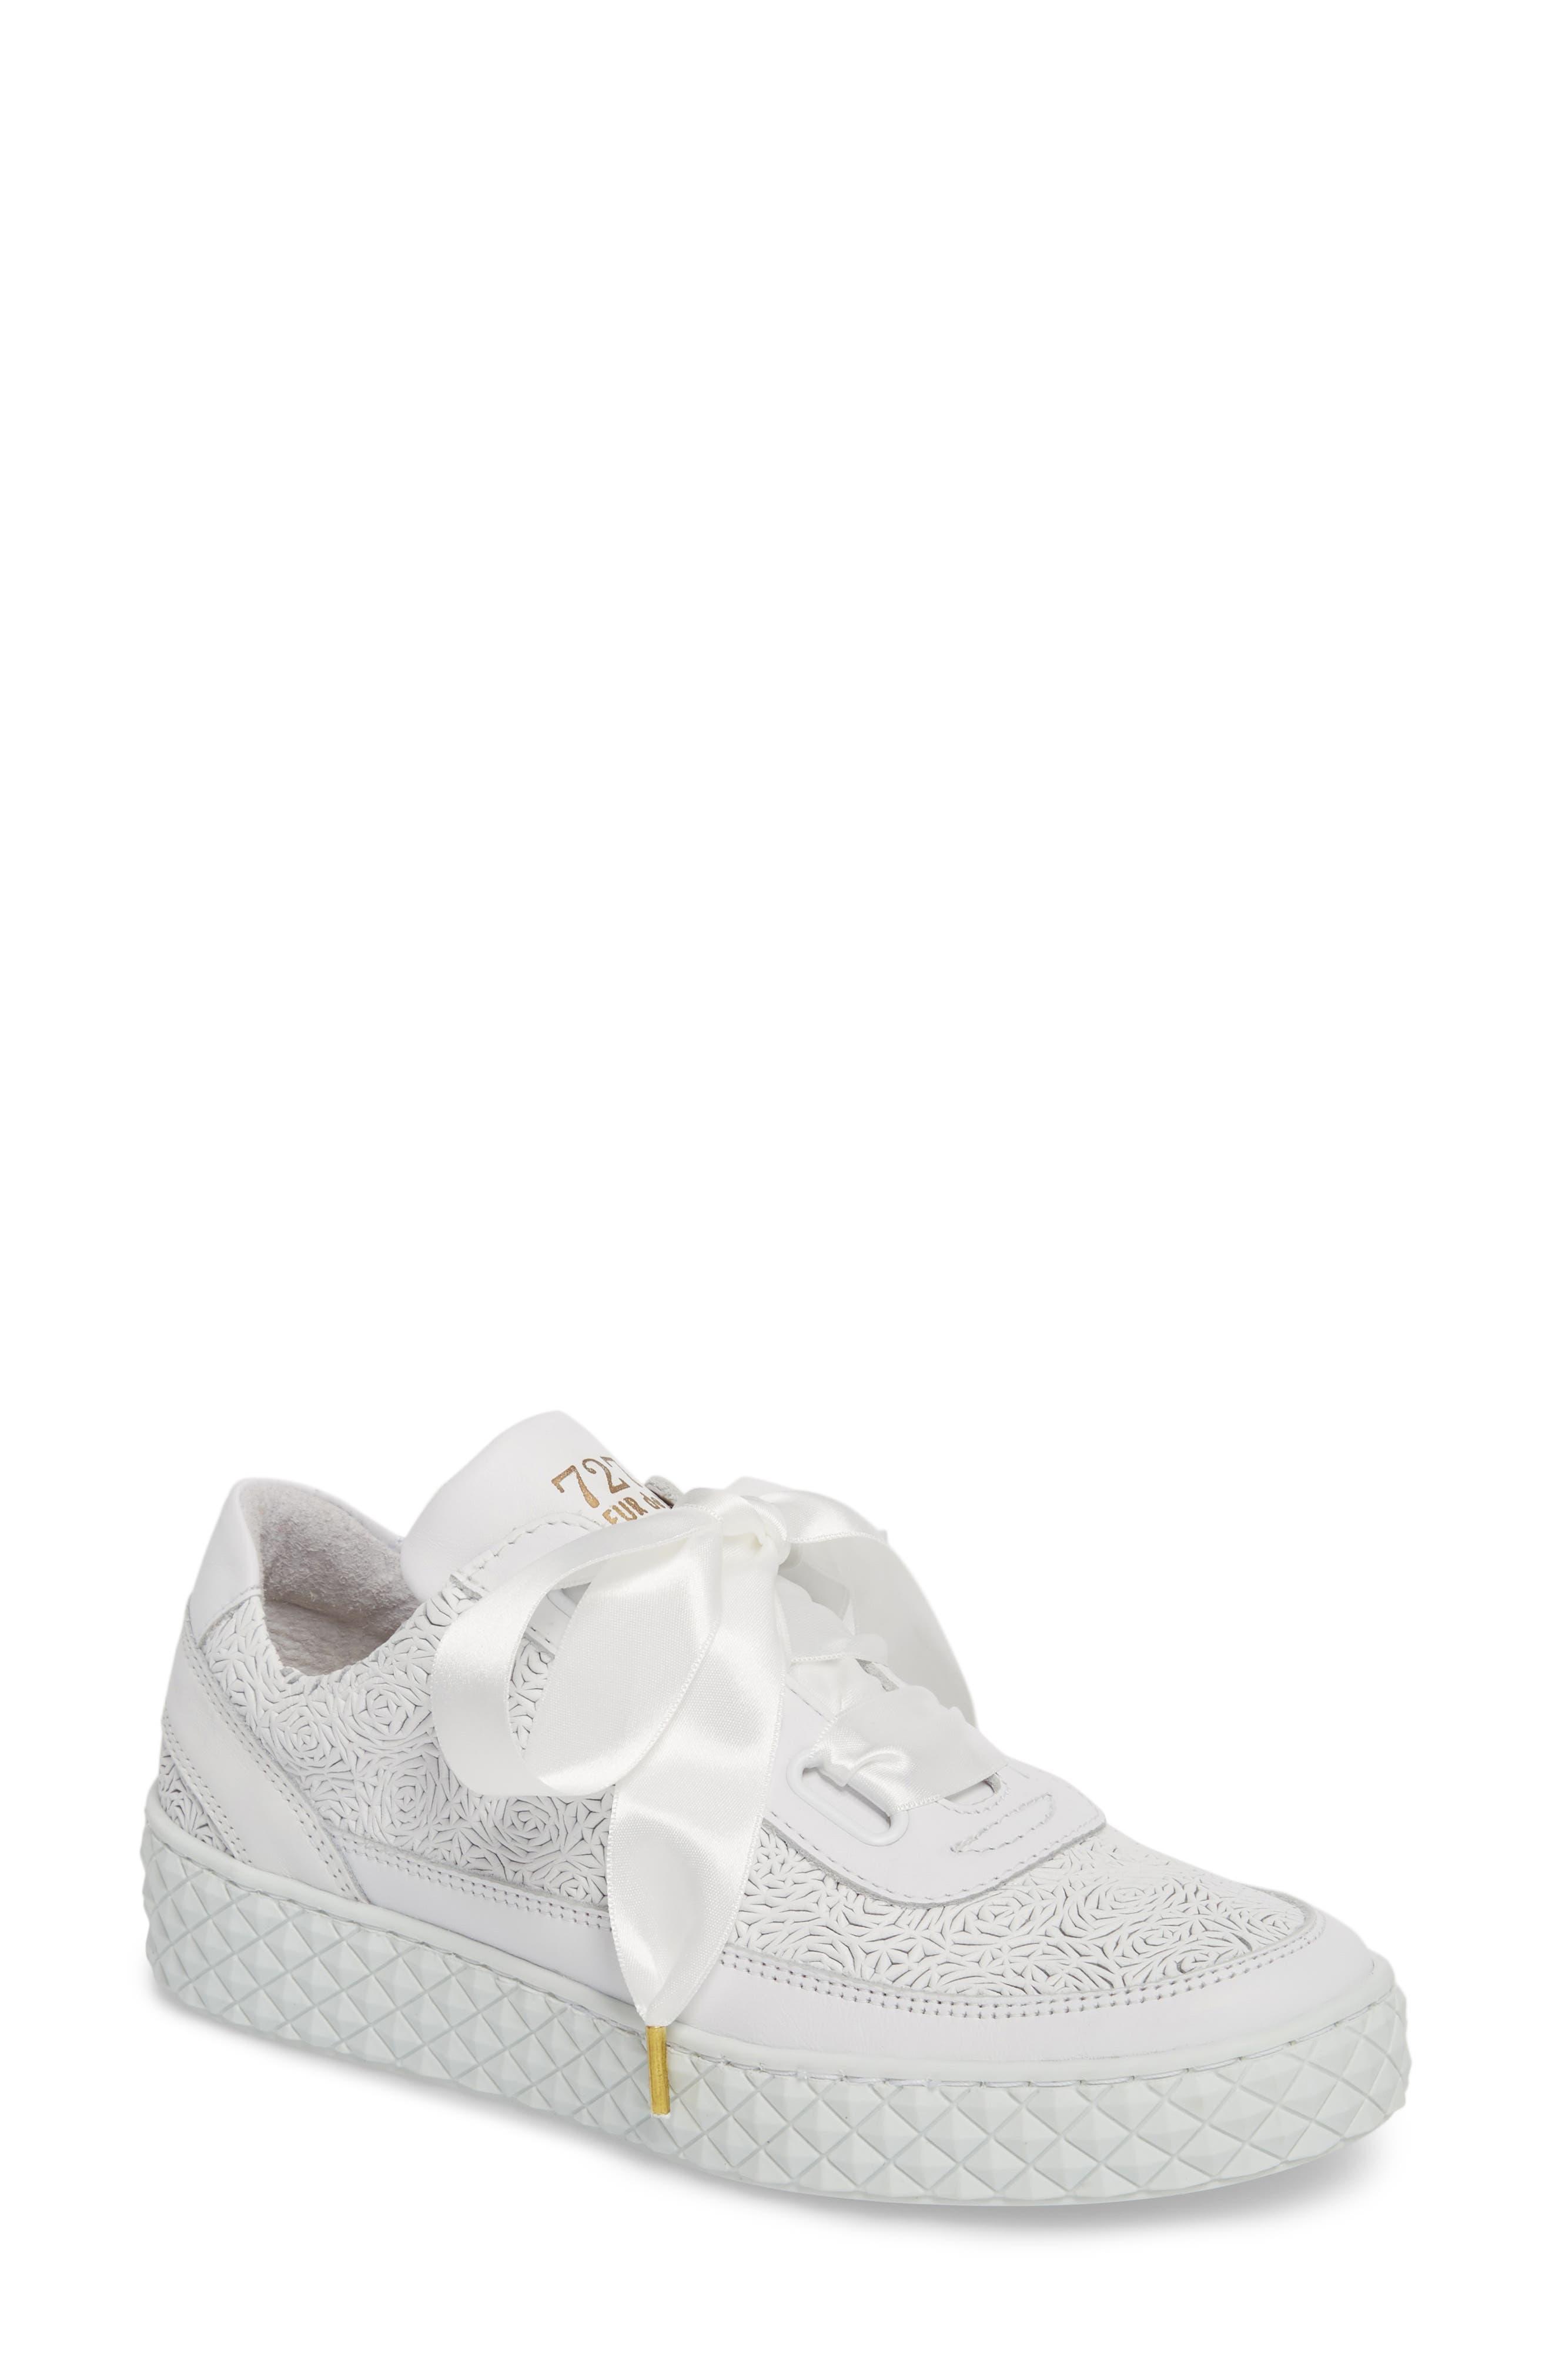 Montreal Sneaker,                         Main,                         color, 110